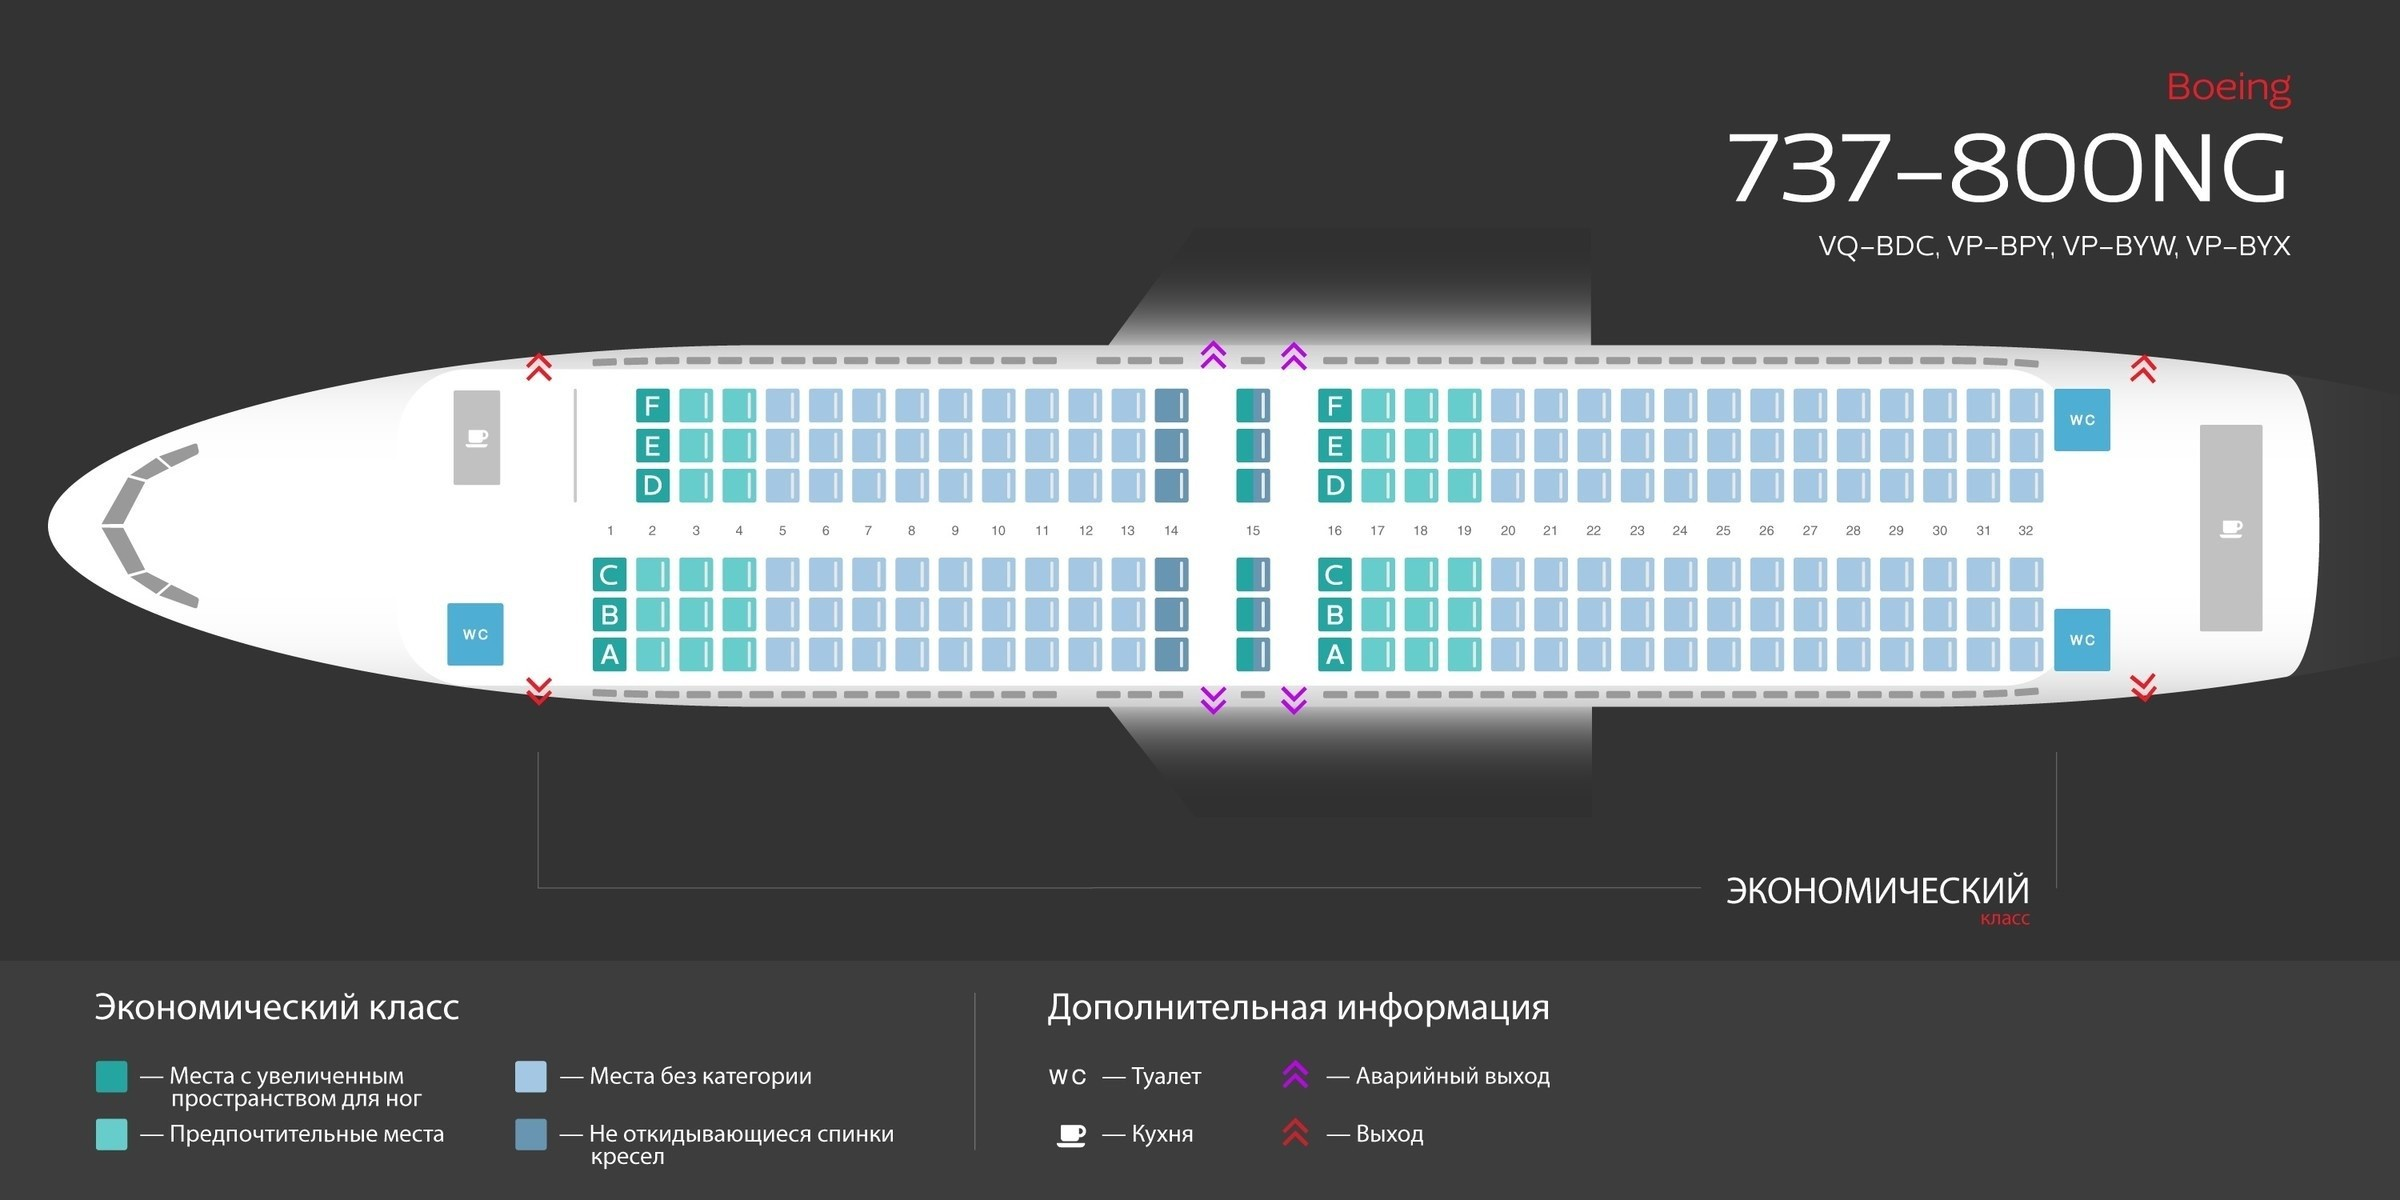 Боинг 737-800 схема салона лучшие места